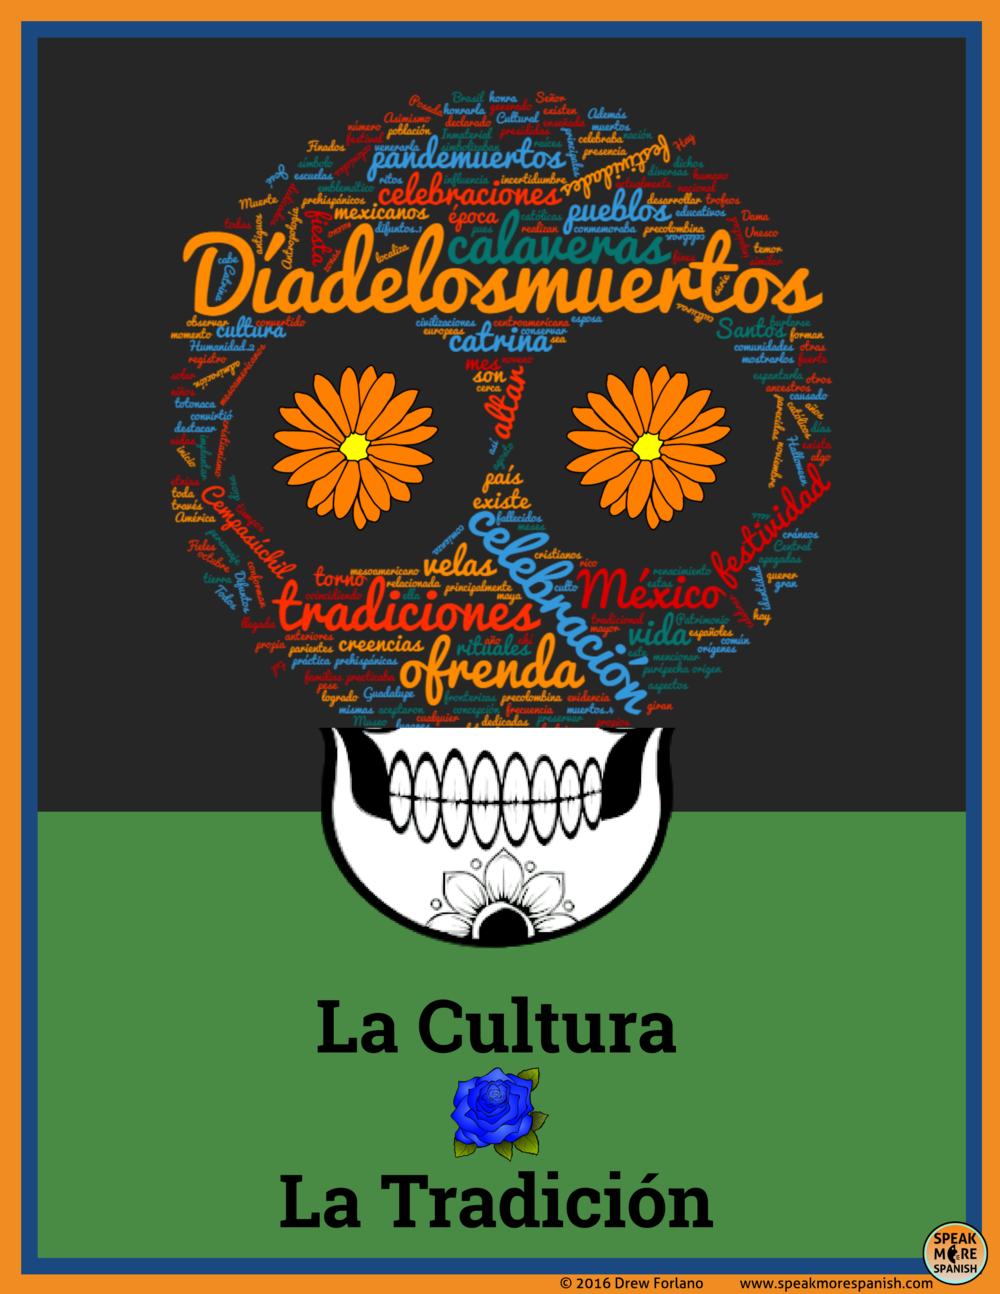 Dia de los Muertos - Free Spanish Poster